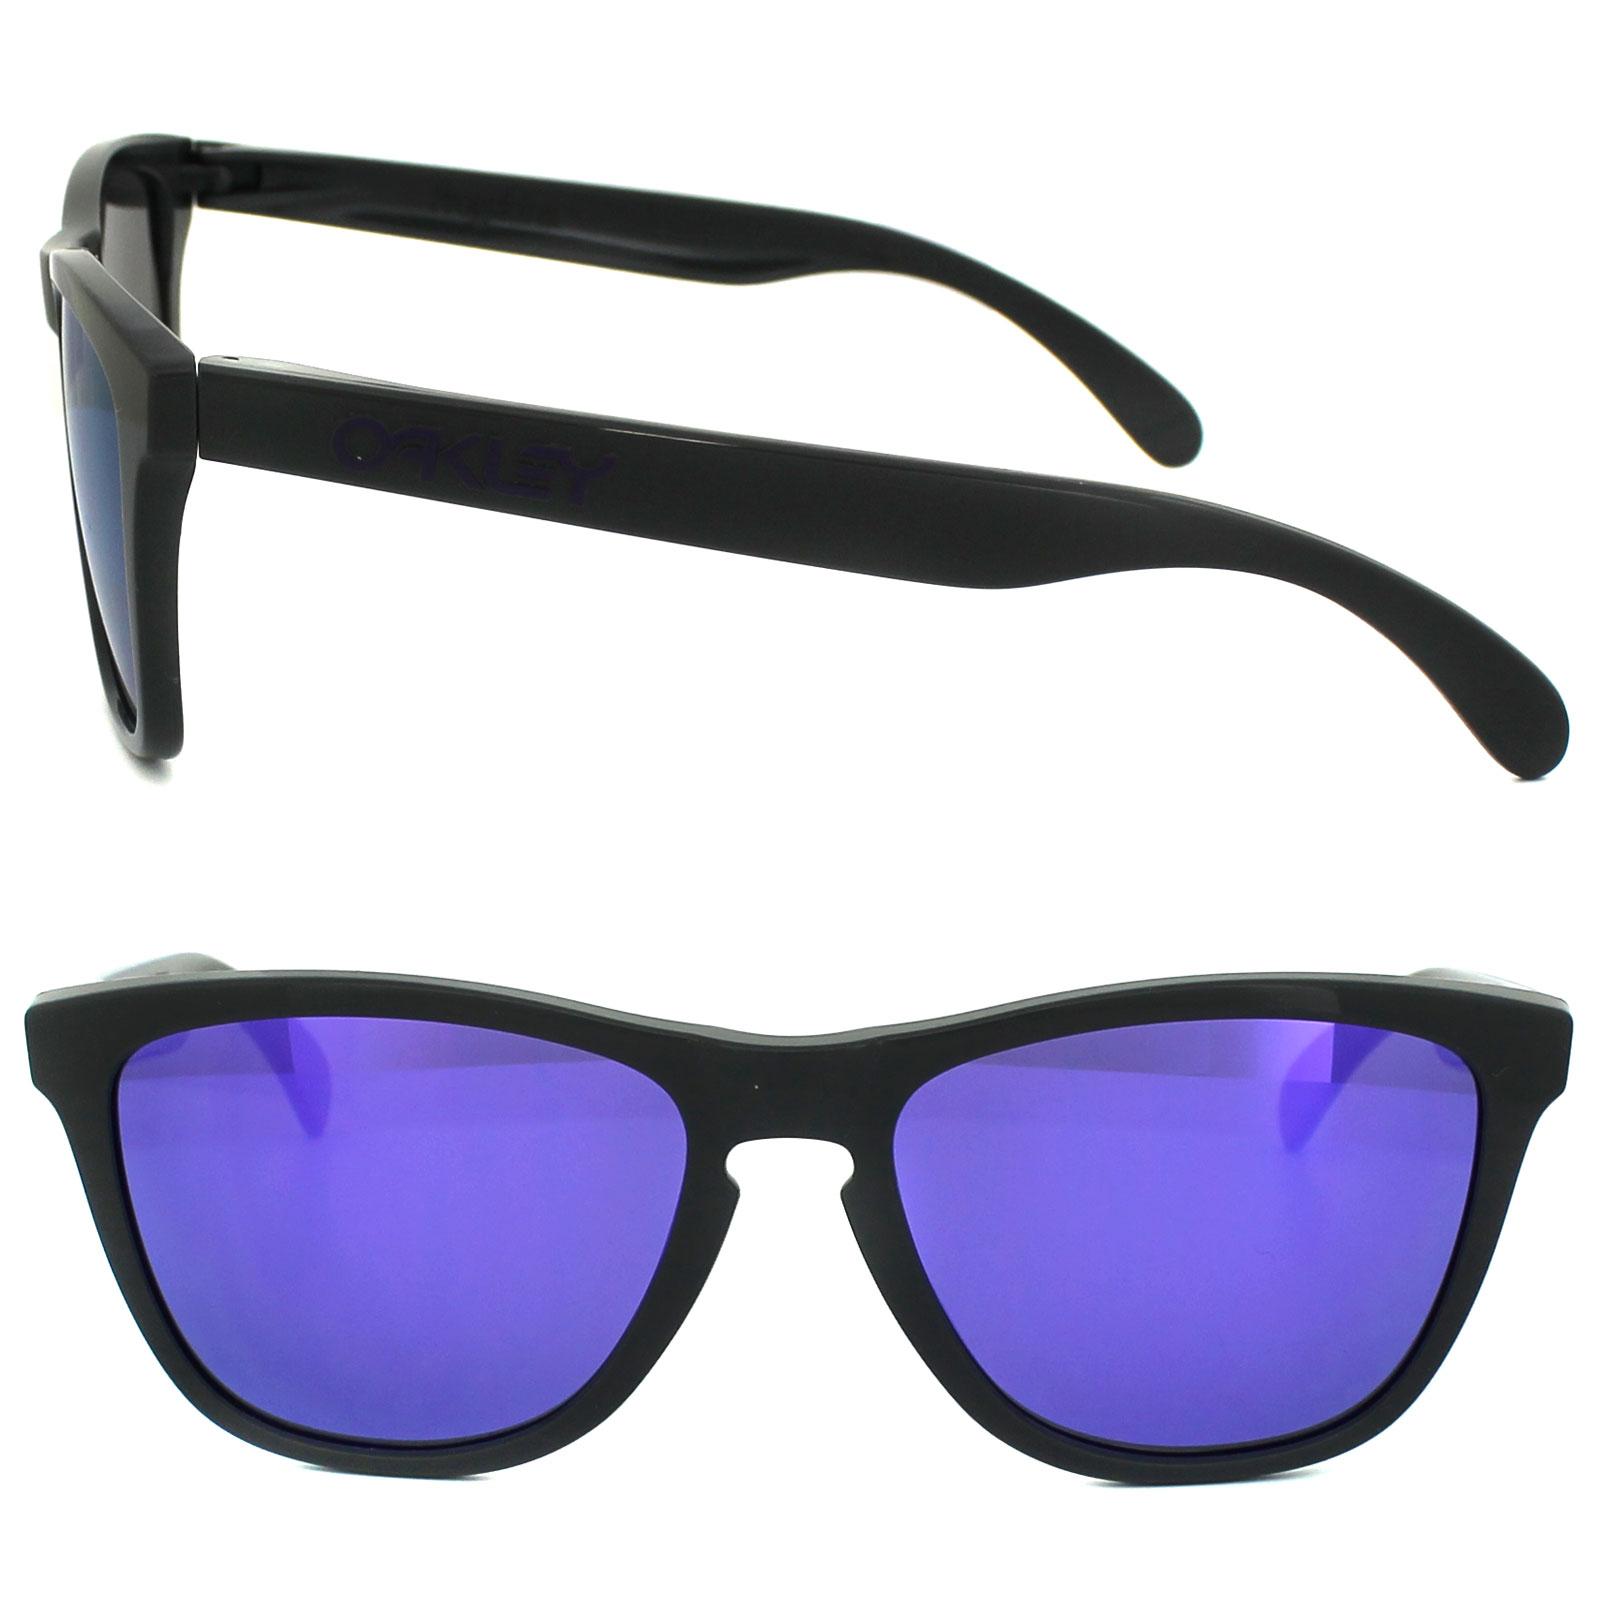 59bcf885639 Oakley Frogskins Grey Violet Iridium